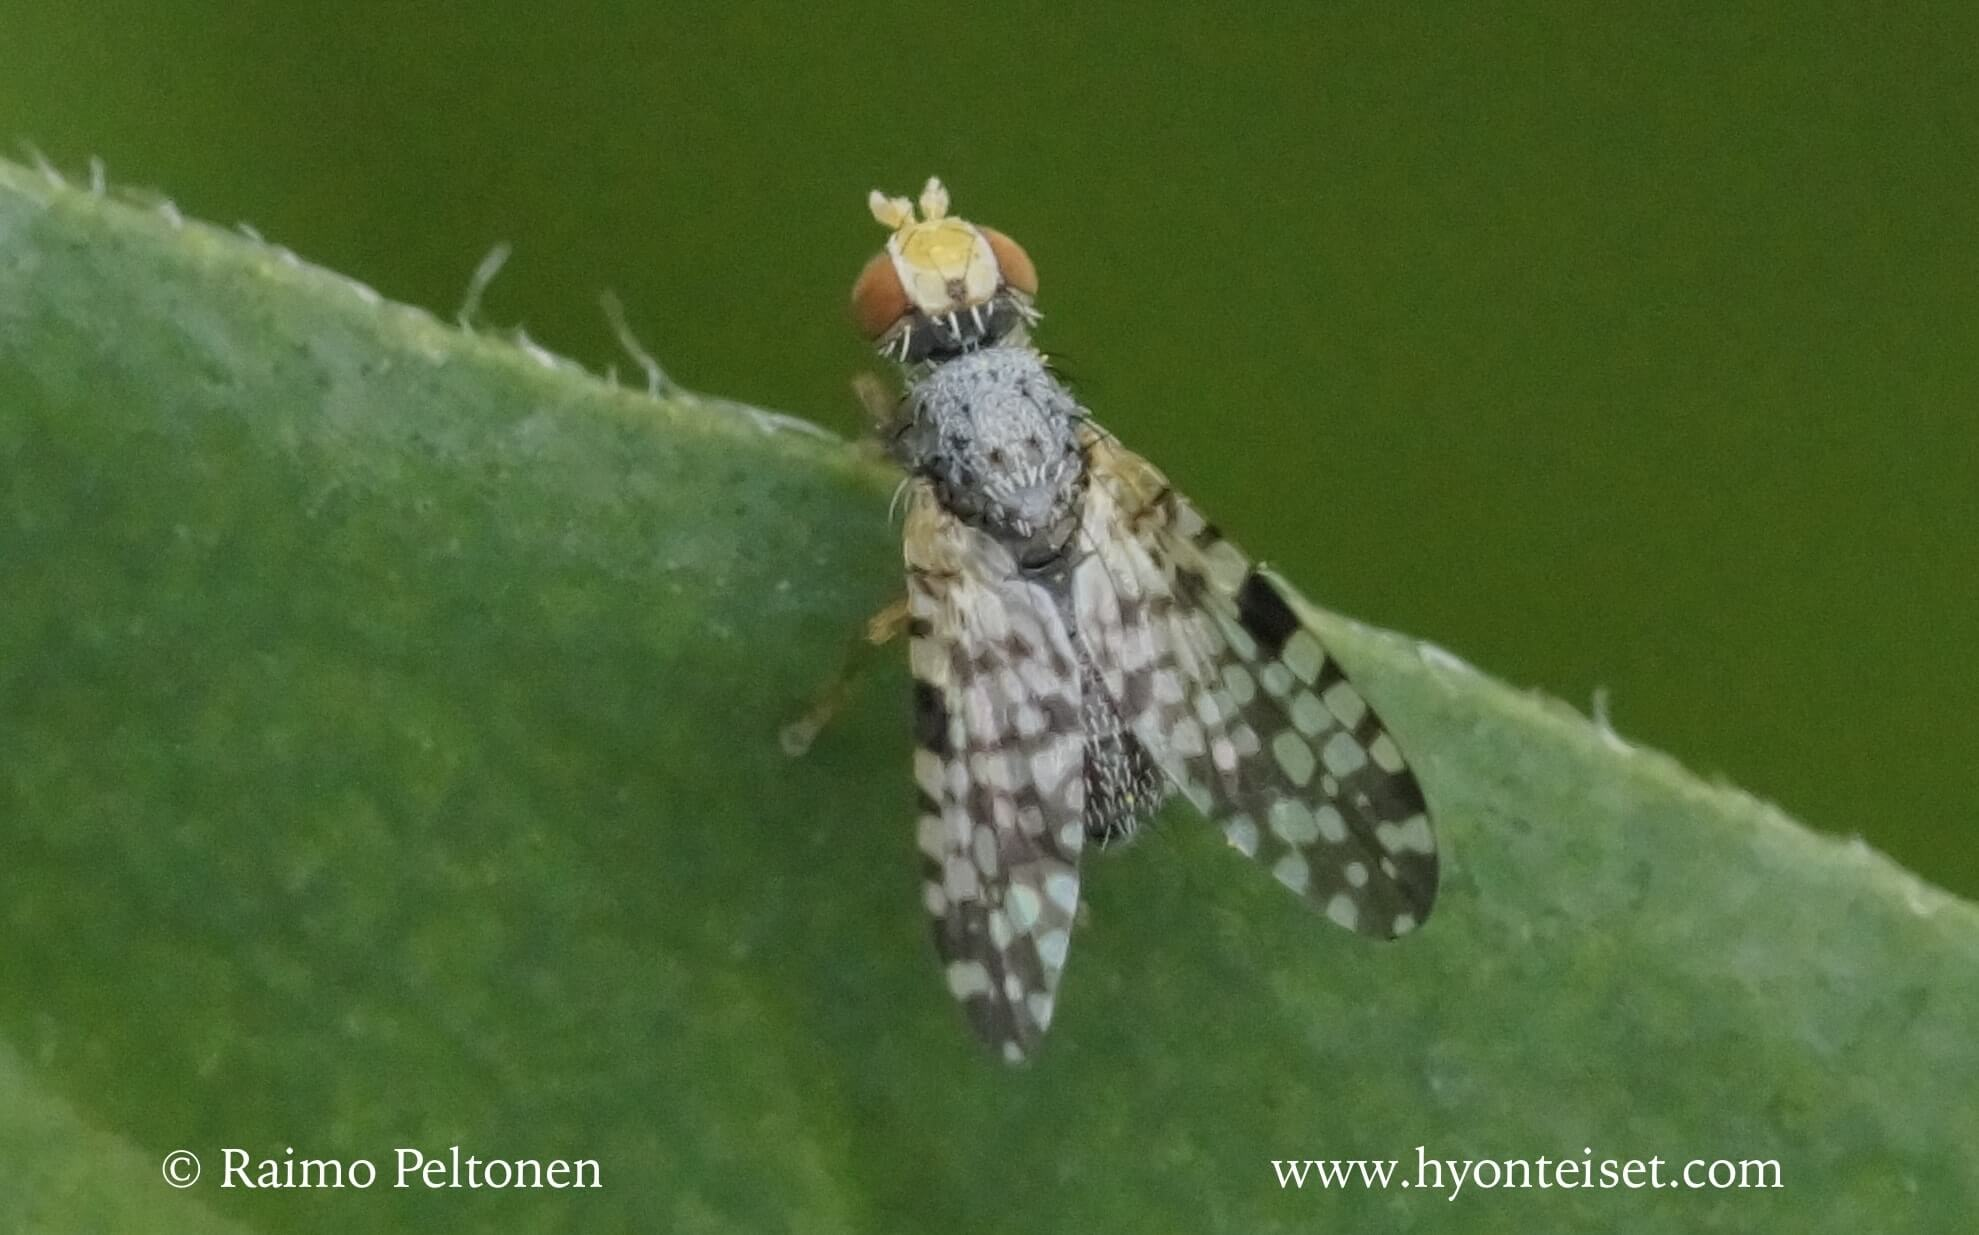 Campiglossa absinthii/punctella (det. Ben Hamers)